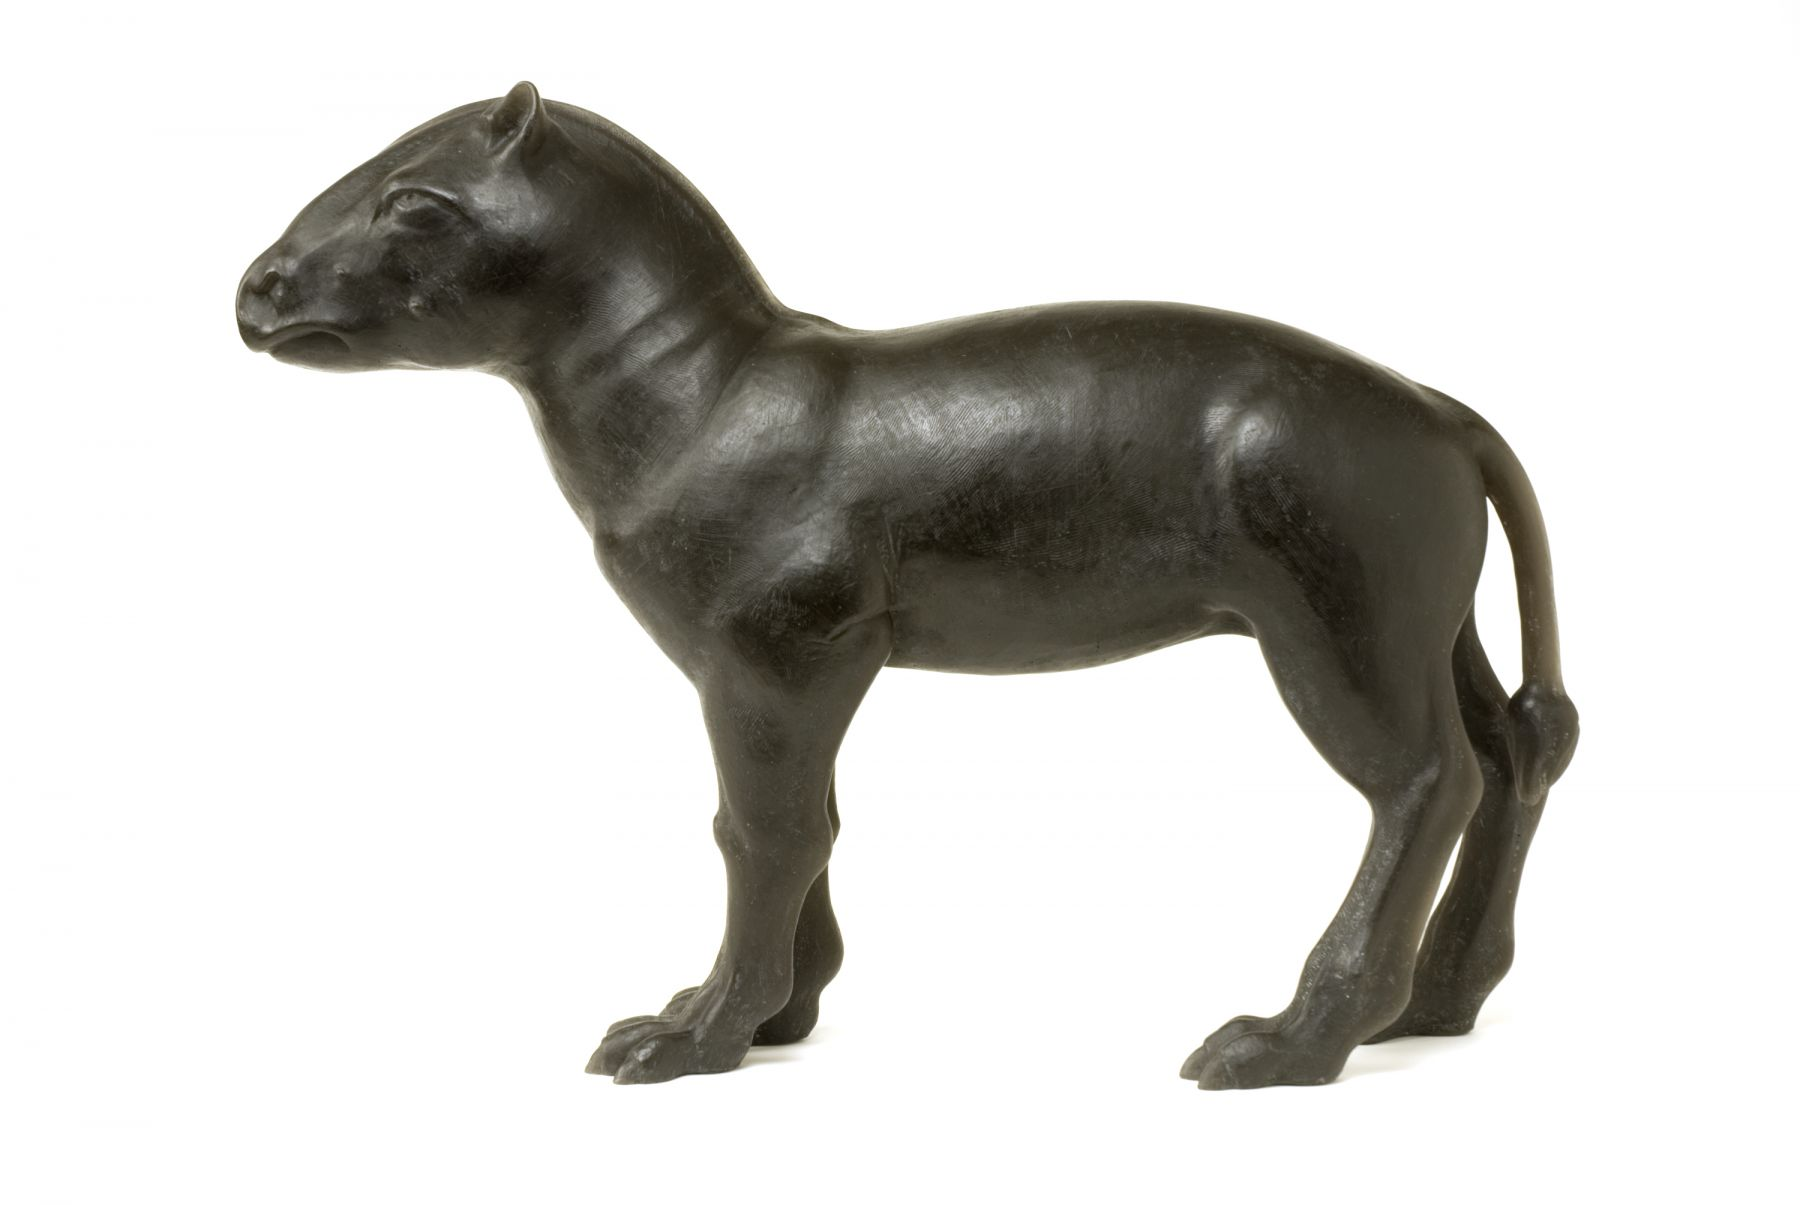 Malia Jensen Dark Horse Polyurethane resin